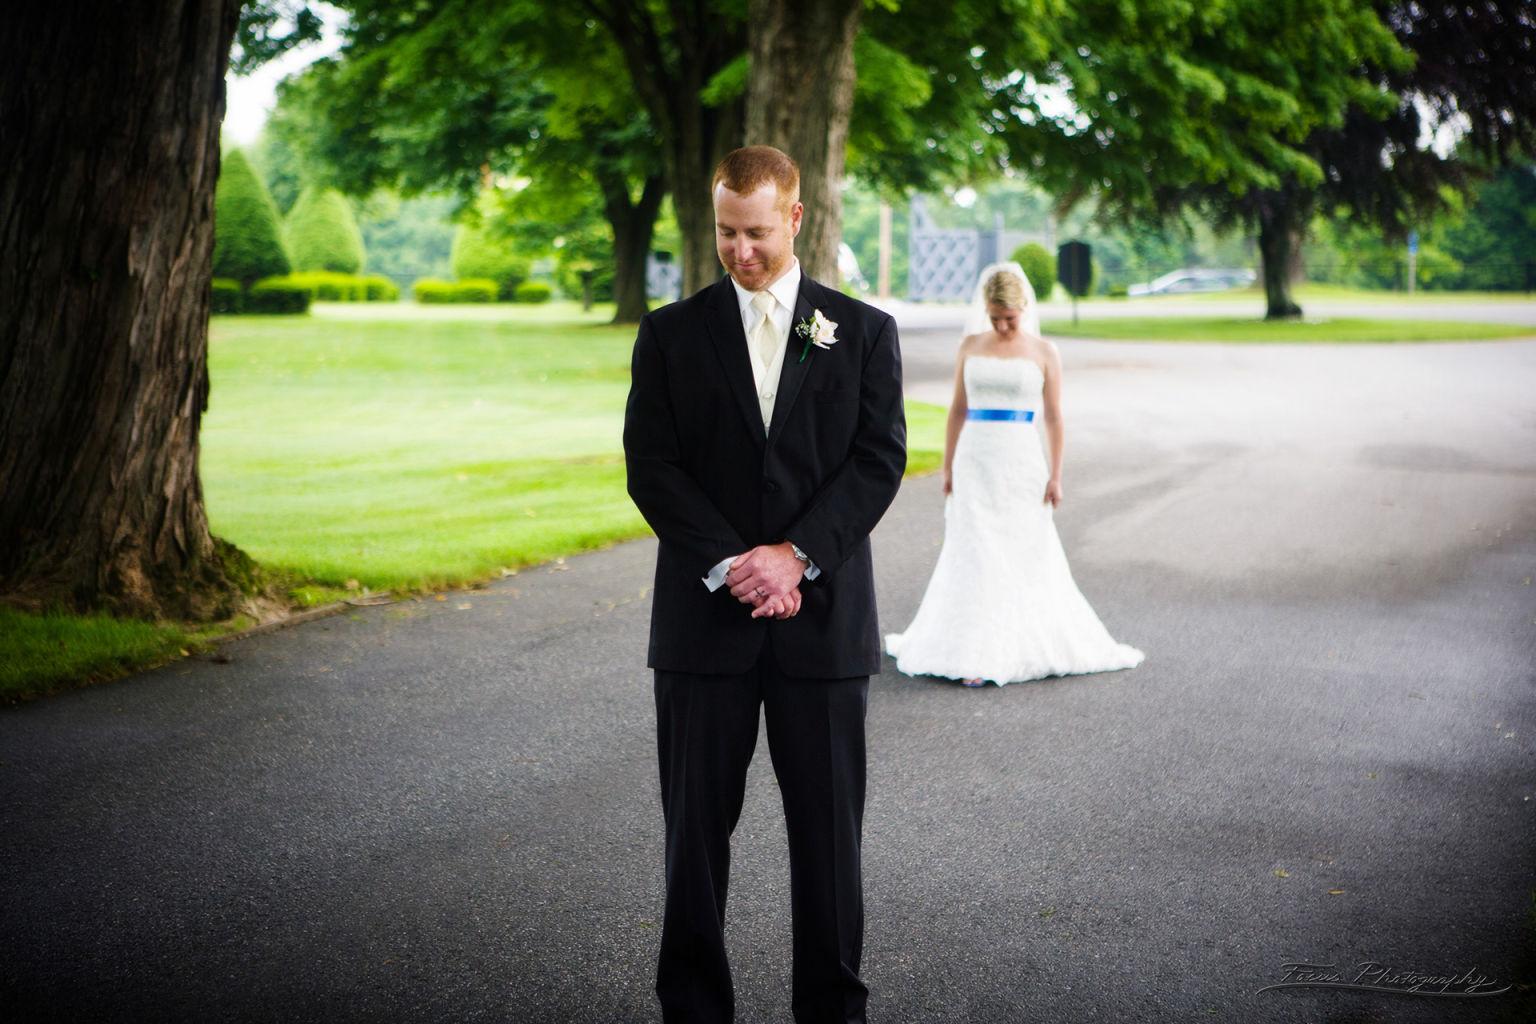 Maine-wedding-photography-149